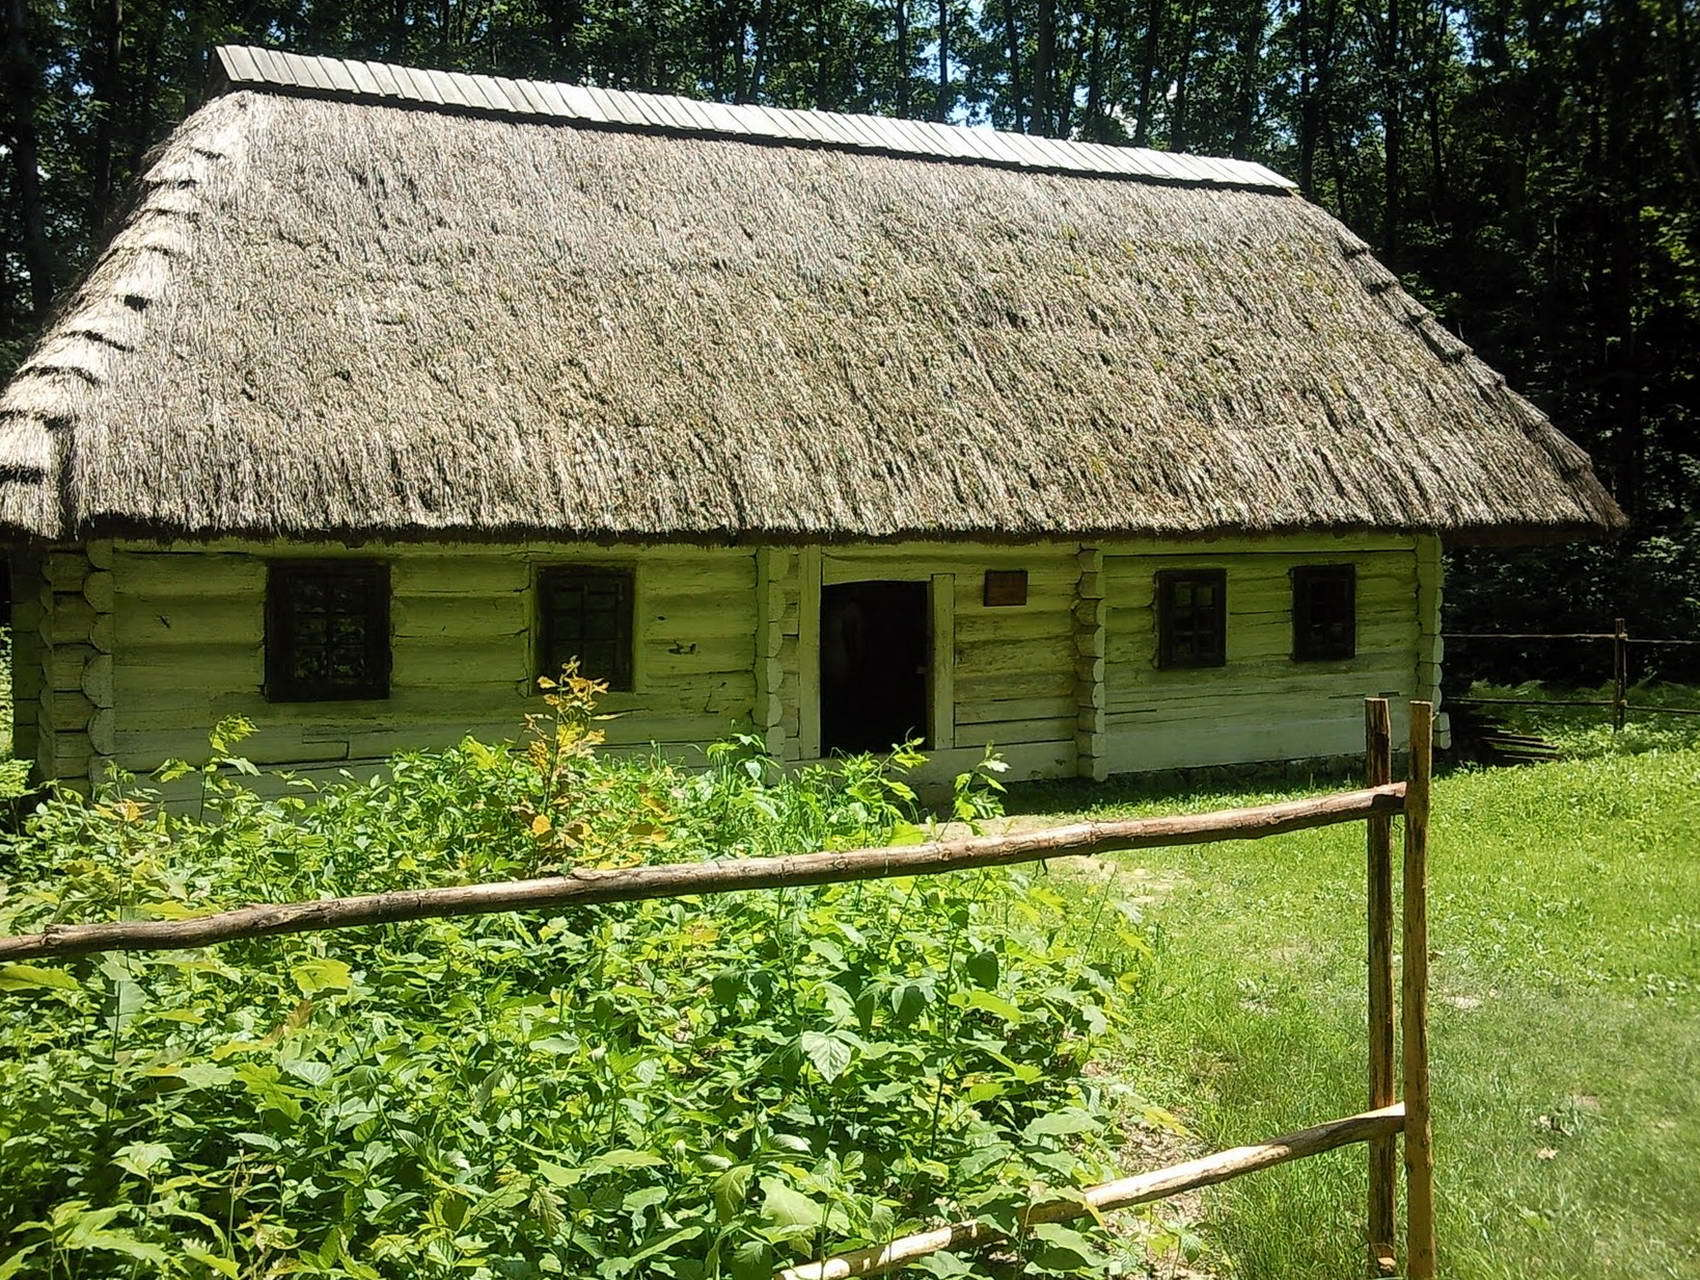 Бойківська хата в музеї побуту та архітектури Прикарпаття, с. Крилос